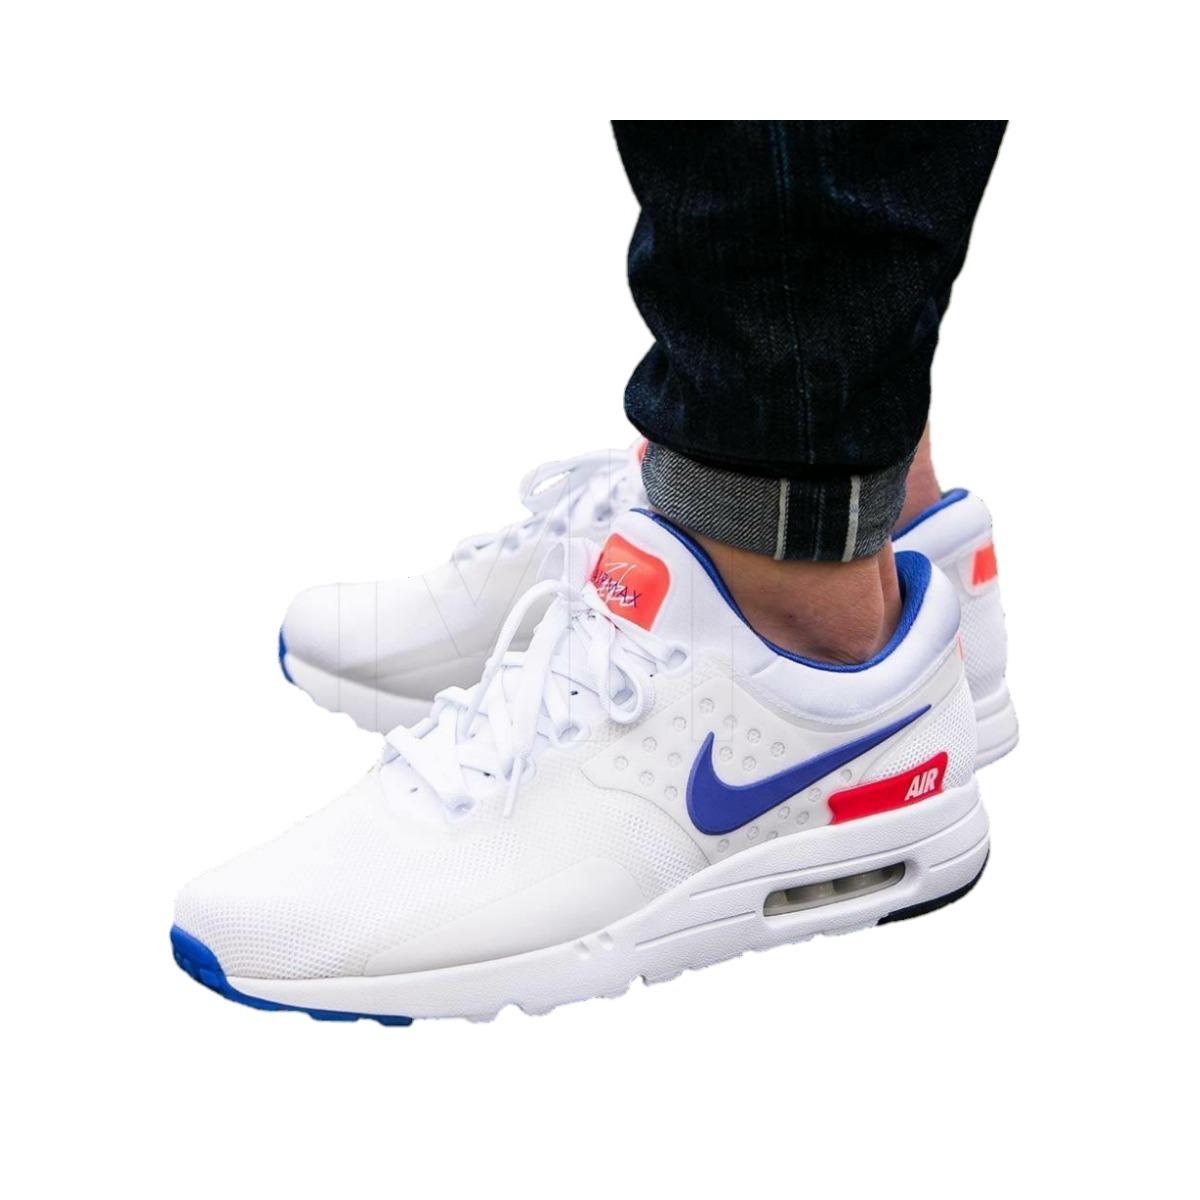 2c6d8f620264a ... new style zapatillas nike air max zero qs ultramarine hombre y mujer. cargando  zoom.